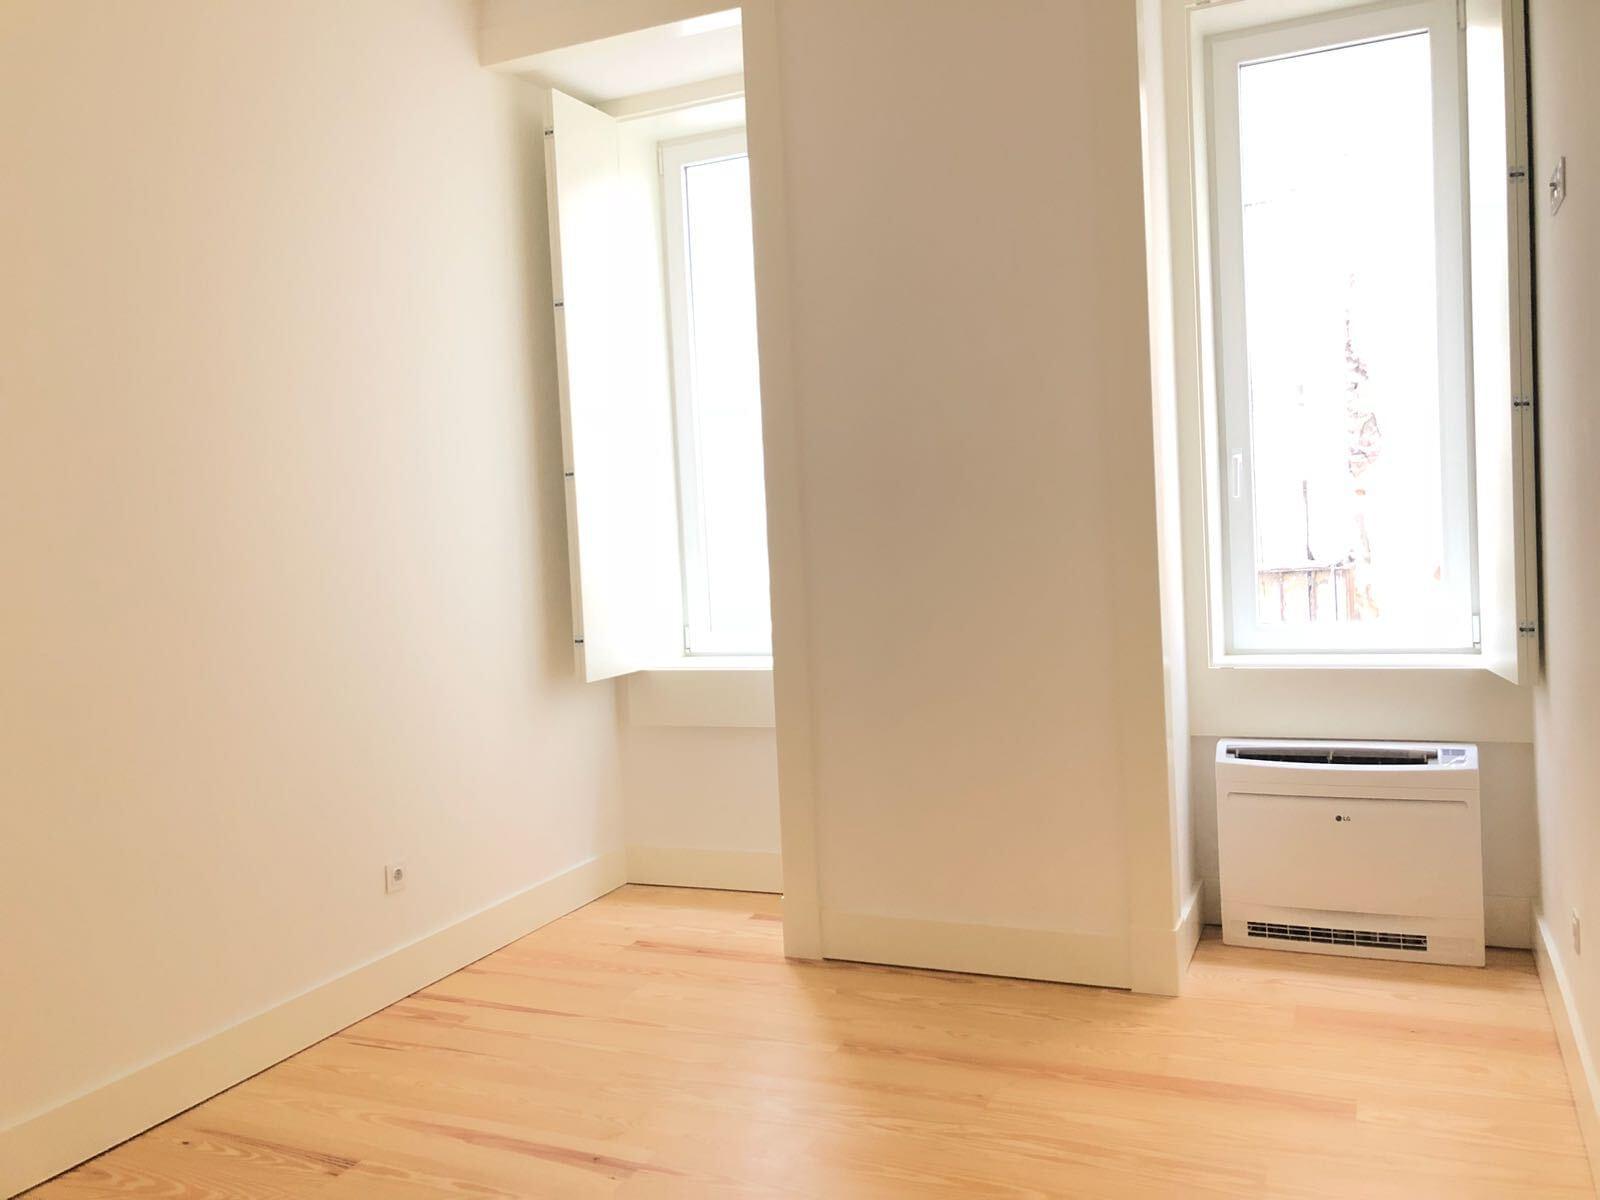 pf17142-apartamento-t2-lisboa-f8f5af35-01f6-4799-bd5c-e28c27cef7d7